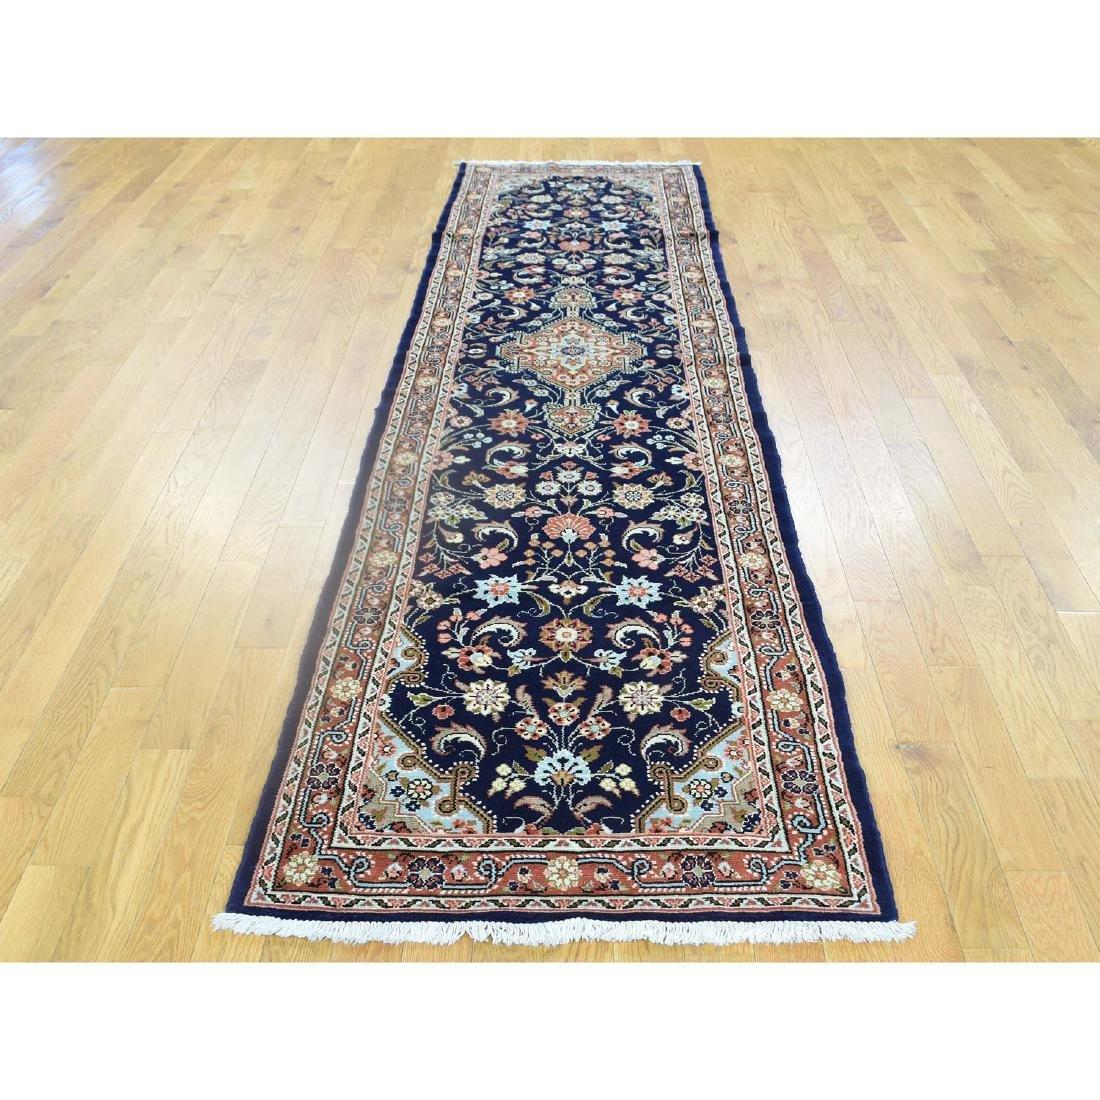 Handmade Persian Hamadan Runner Oriental Rug 2.8x10.2 - 2